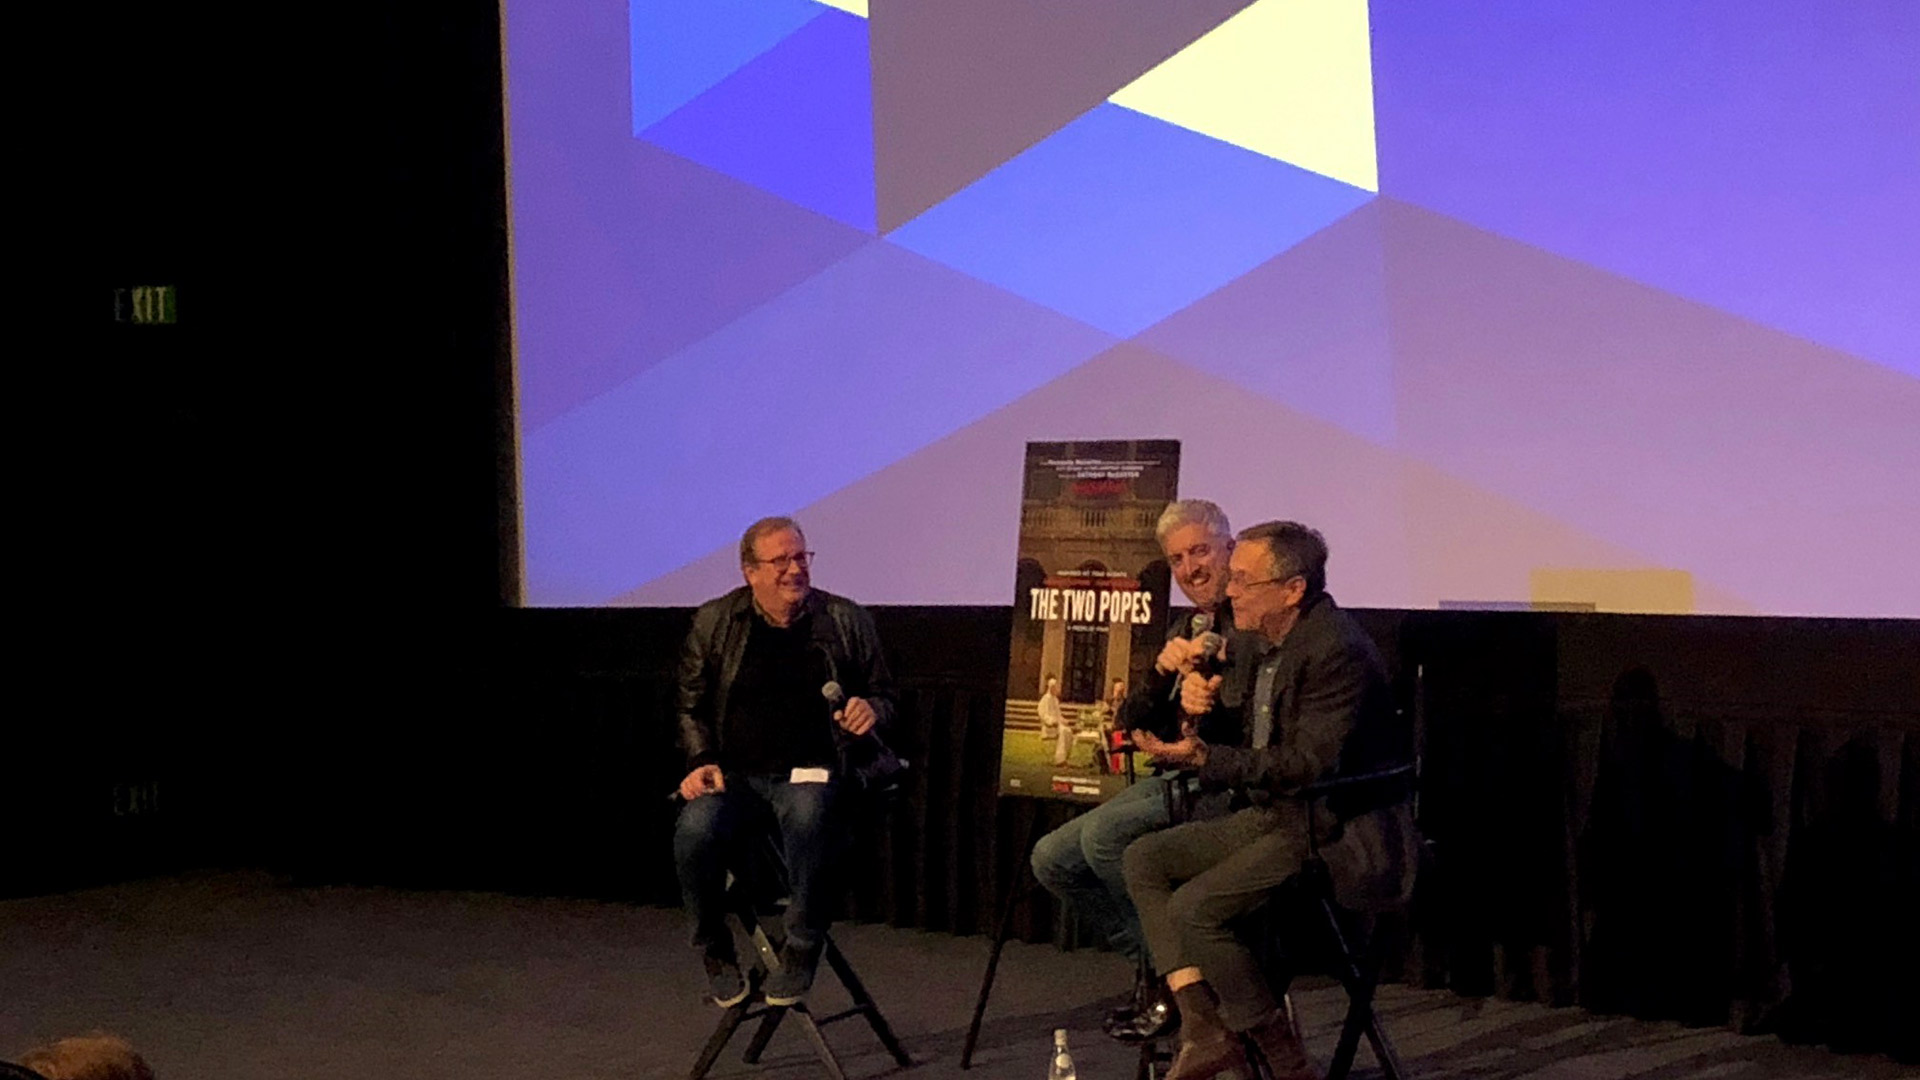 Post screening Q&A with Pete Hammond, Anthony McCarten, and Fernando Ferreira Meirelles